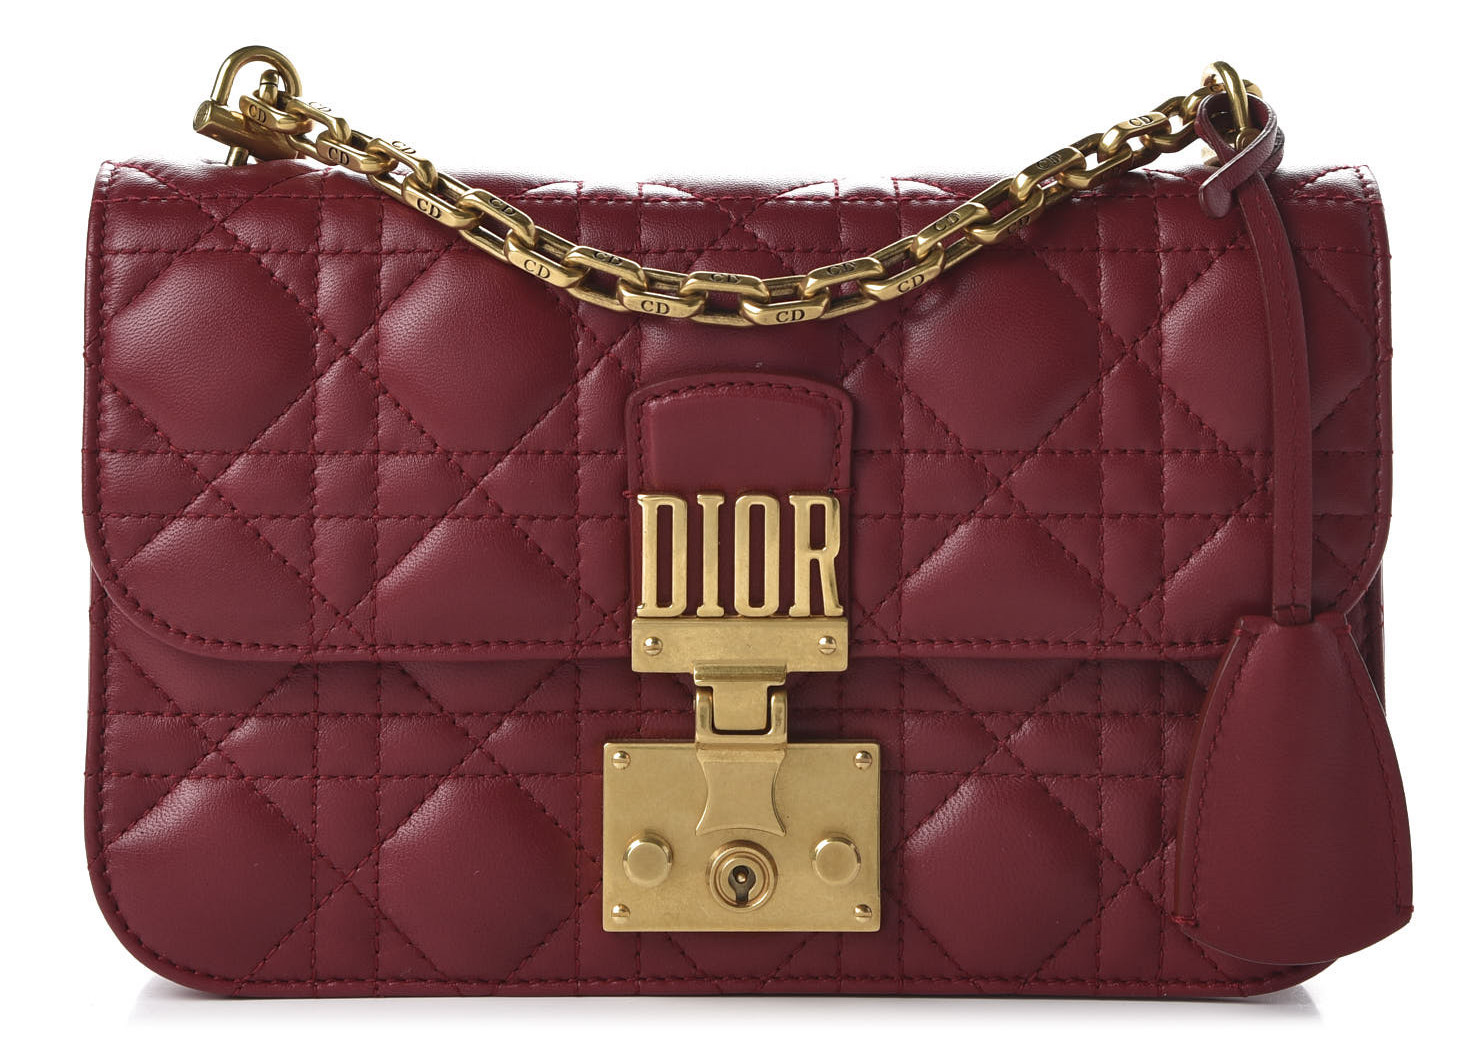 Dior Dioraddict Small Flap Bag